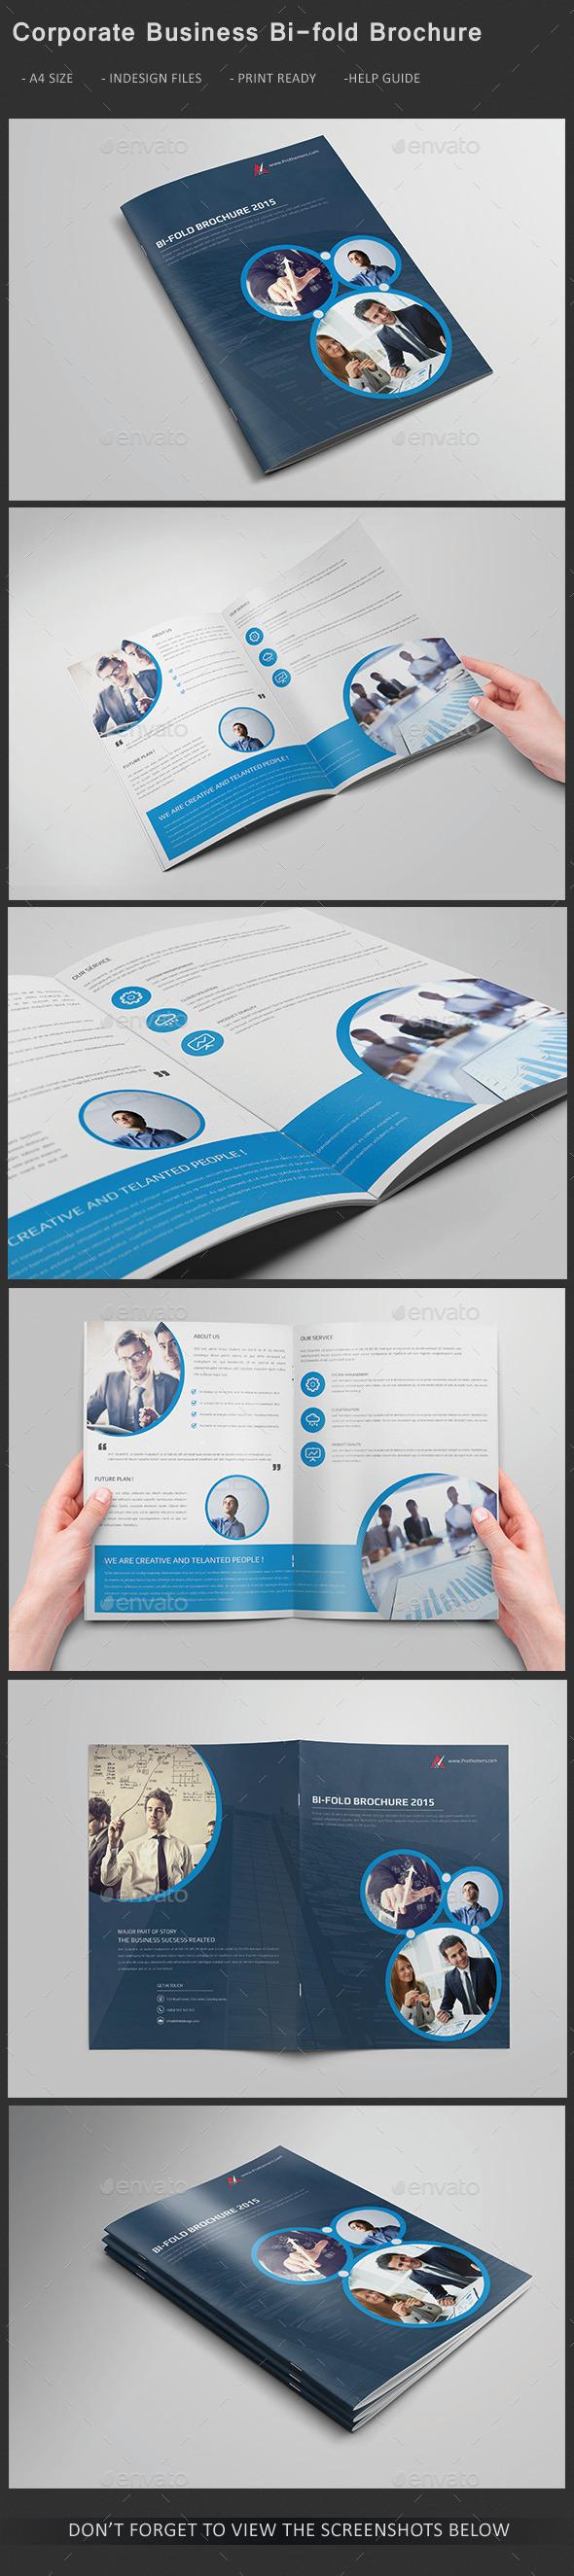 GraphicRiver Corporate Business Bi-fold Brochure 11507089